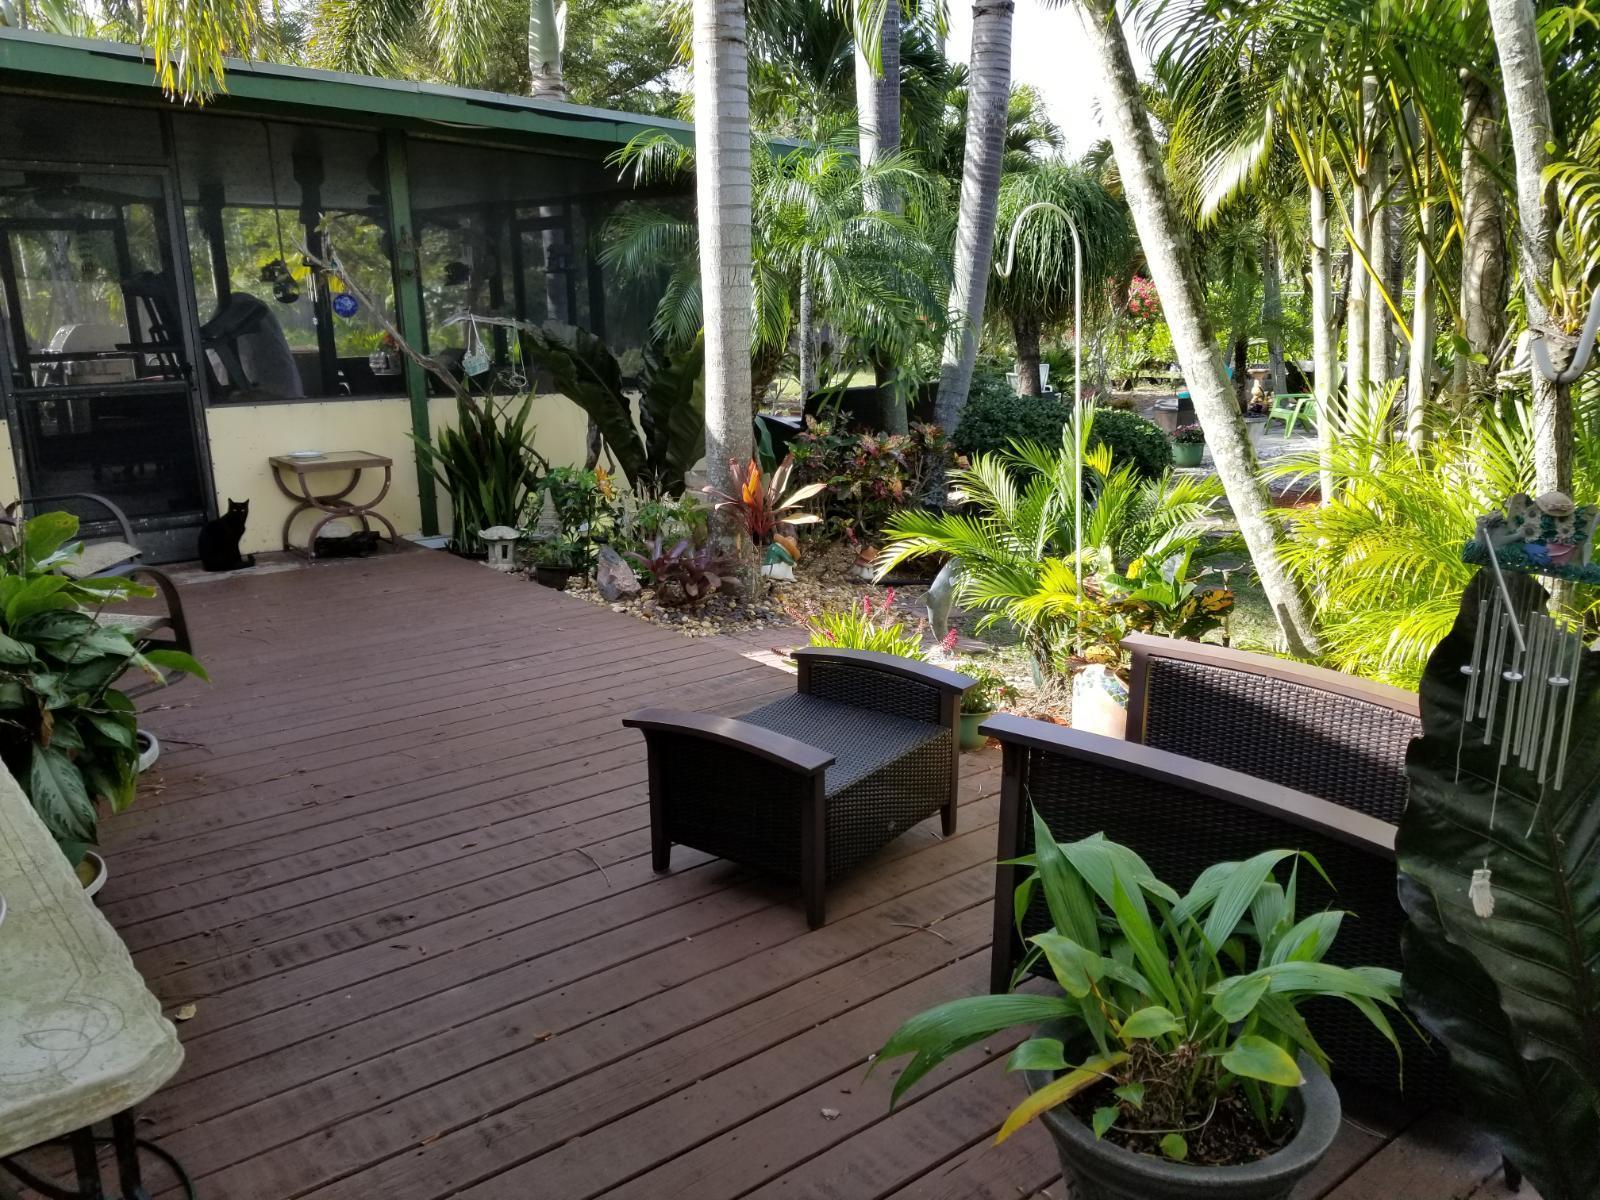 Home for sale in Loxahatchee, The Acreage, Royal Palm Acreage The Acreage Florida